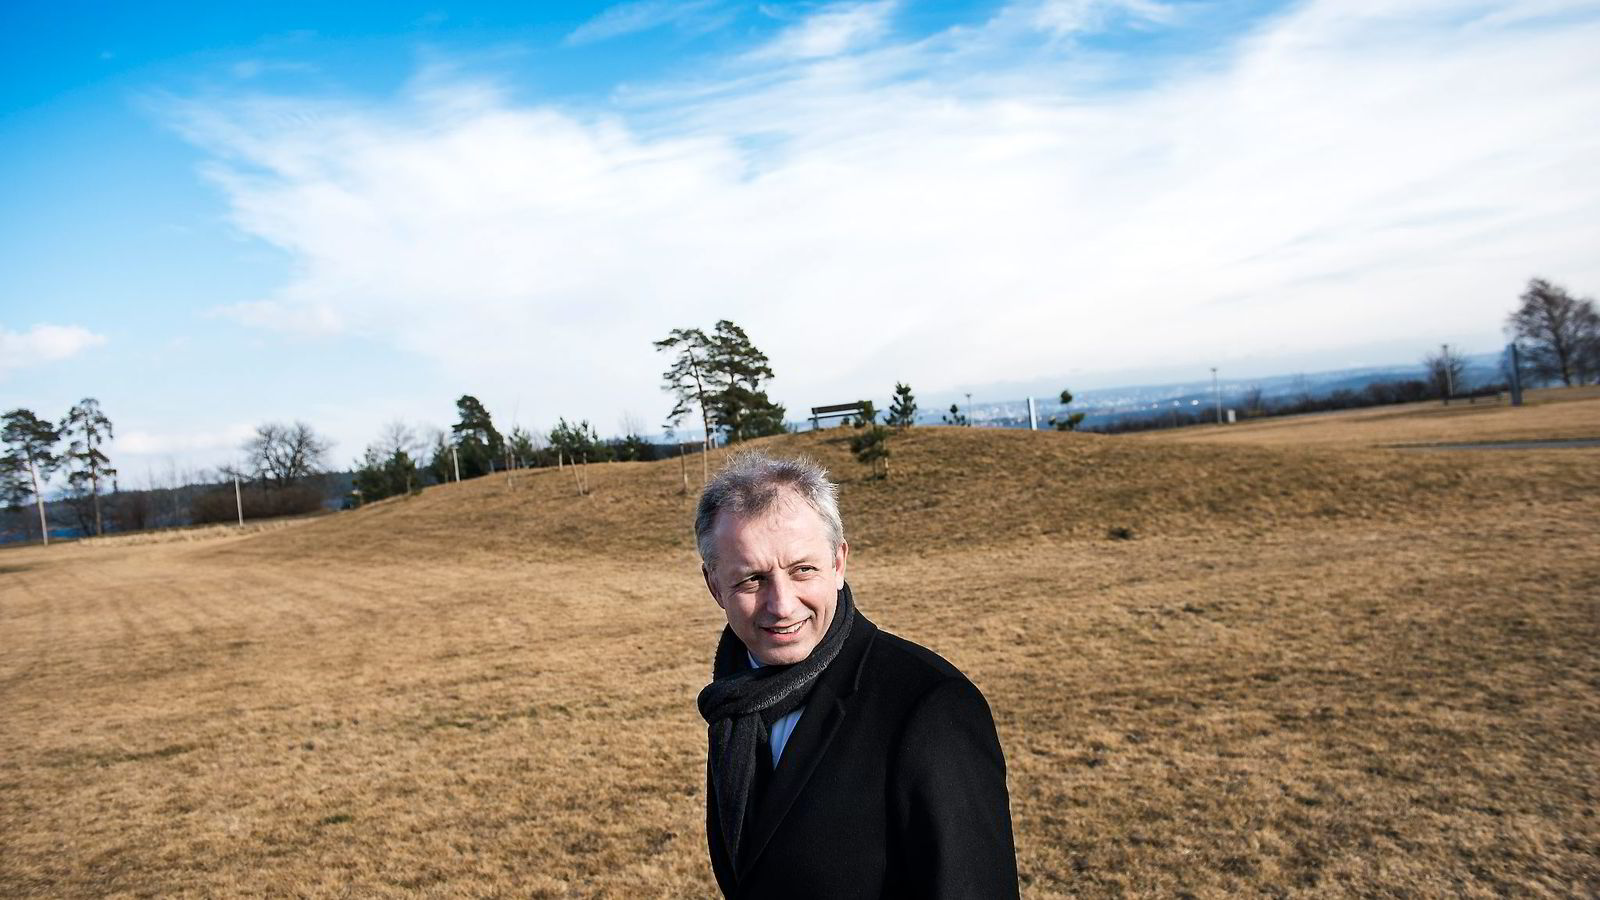 Økokrim spør Vimpelcoms tidligere sjef Jo Lunder ut om utbetalinger på 30 millioner dollar til en konto i Sveits i 2011.